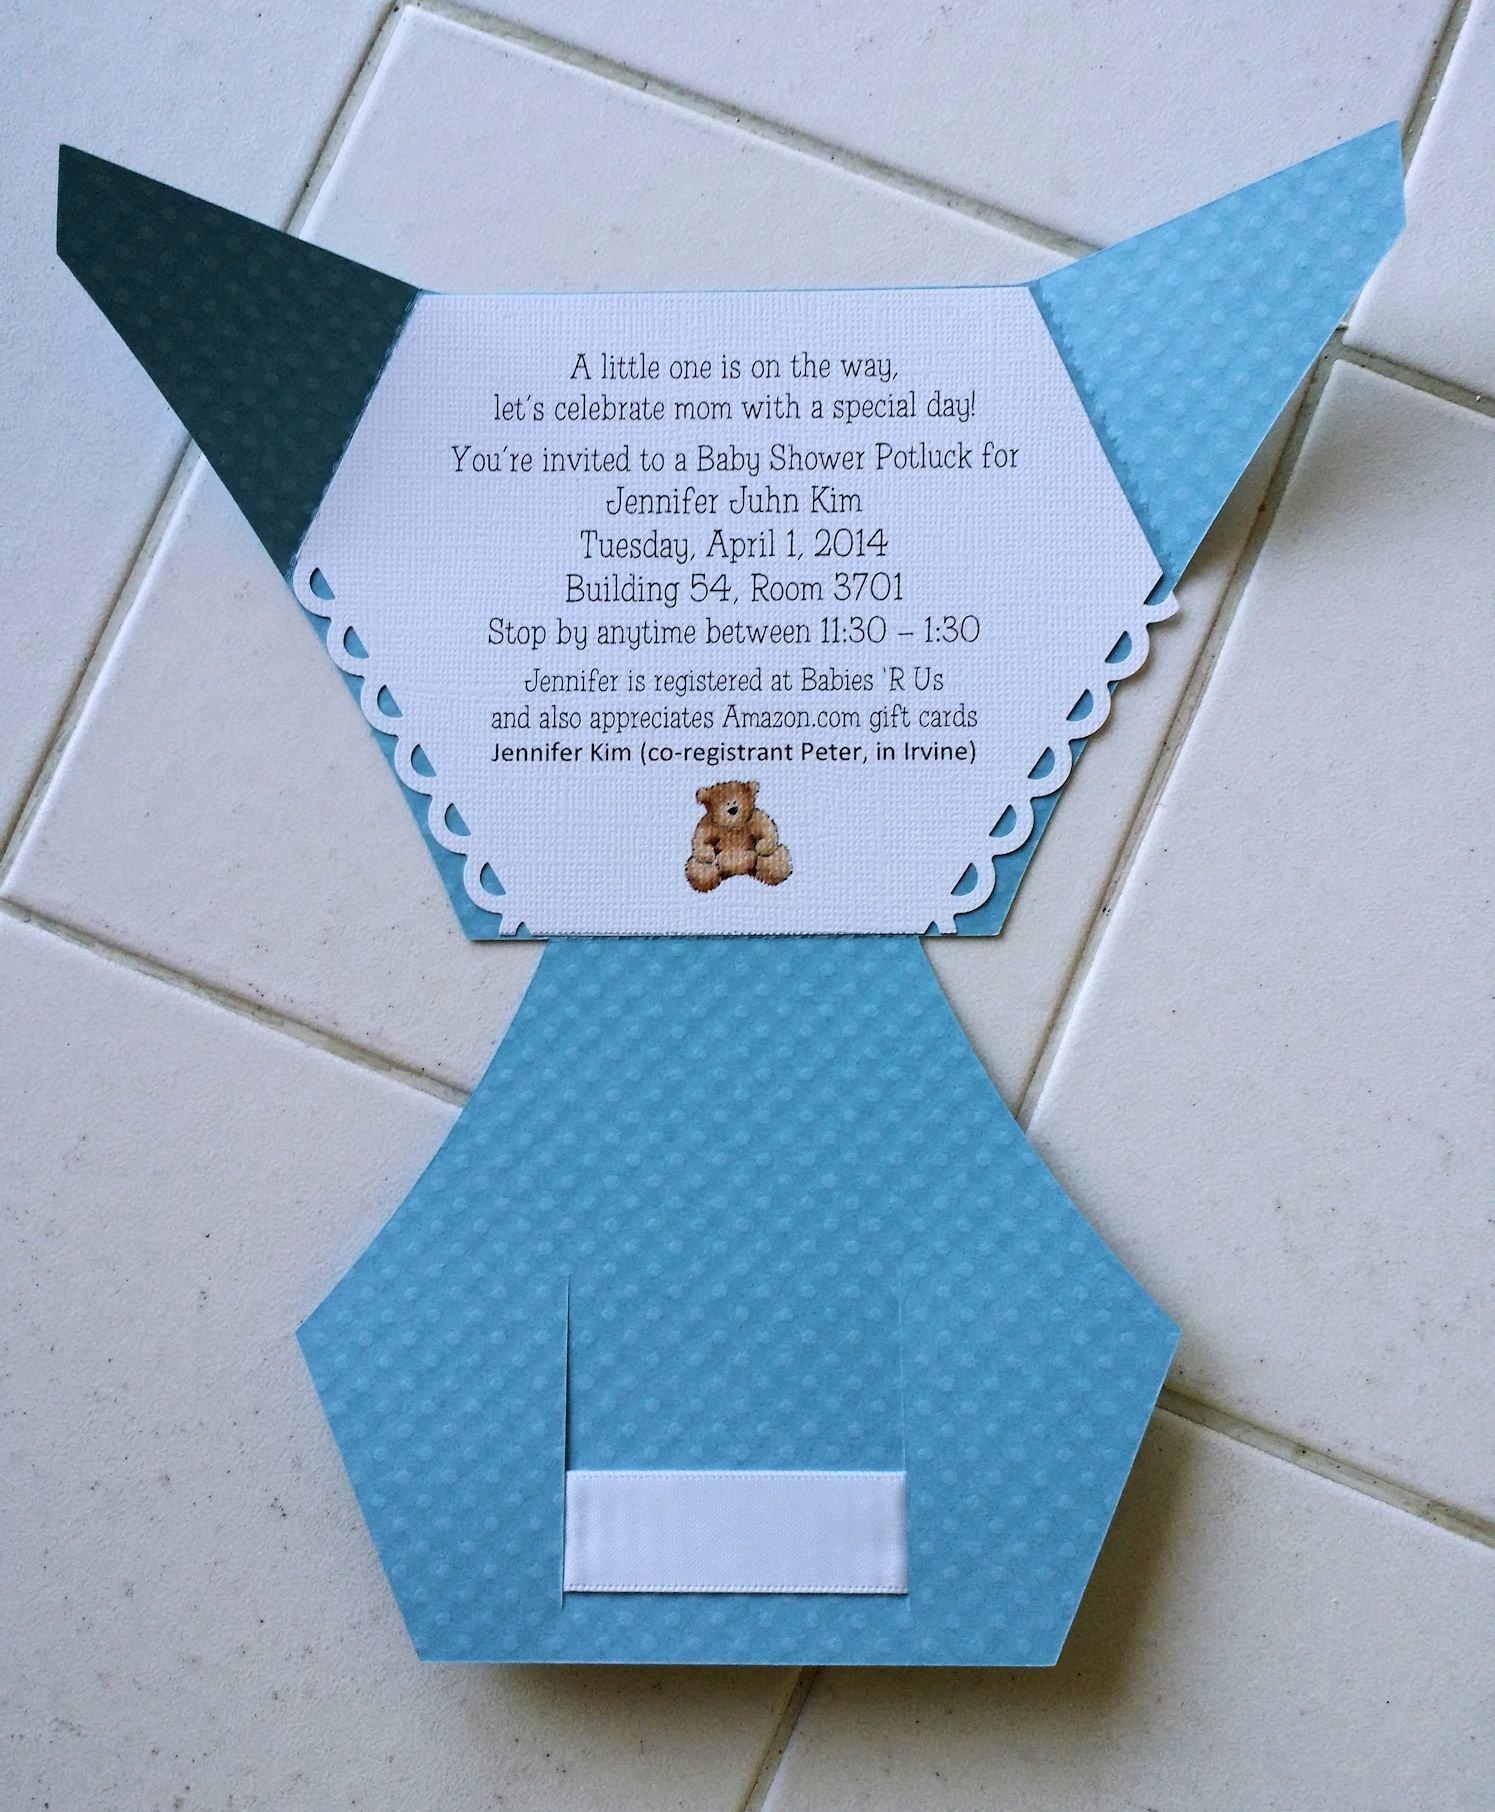 Baby Diaper Invitation Template Elegant Diaper Invitation Template Cricut Templates Resume